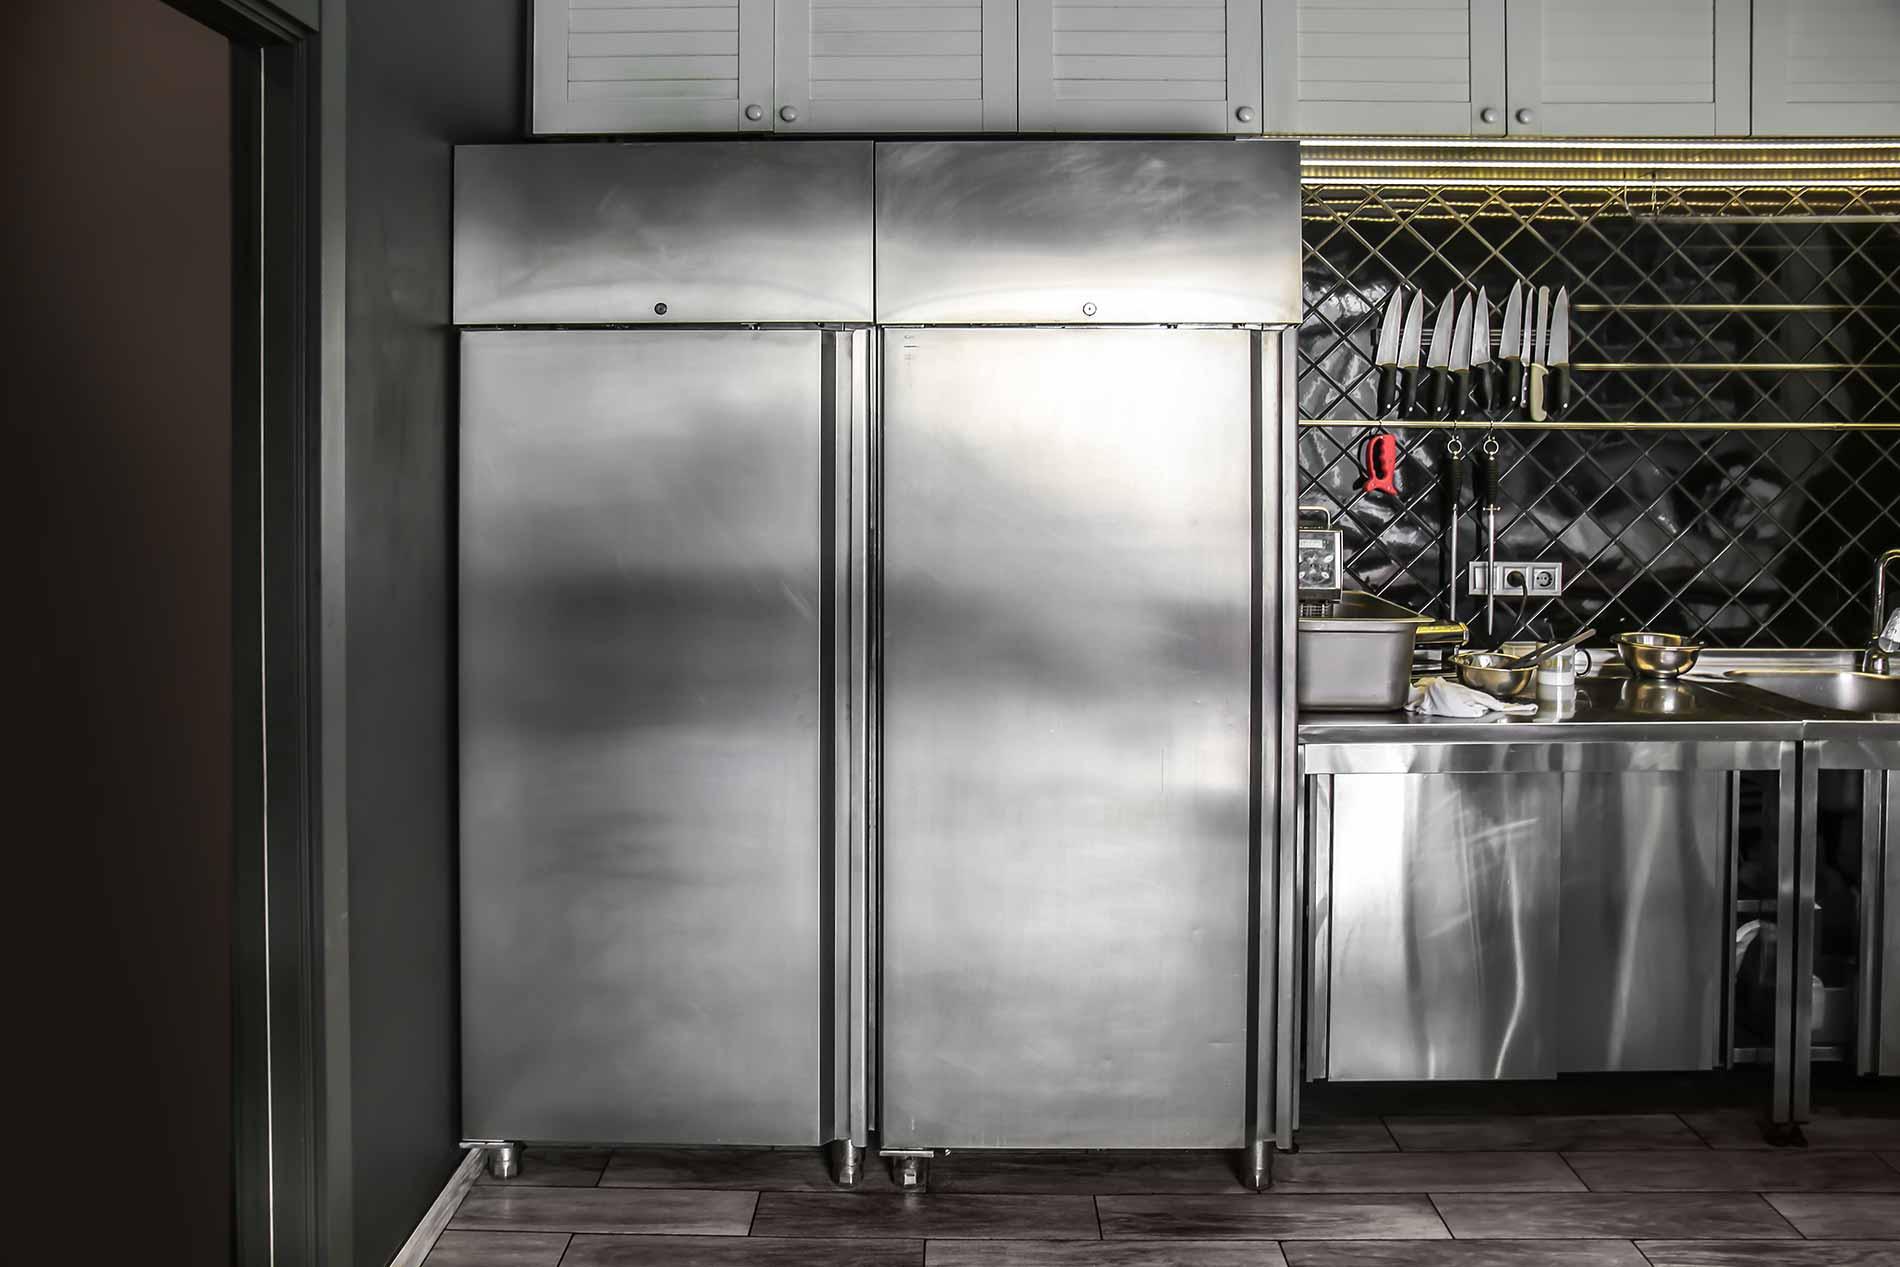 The-mechanics-behind-refrigeration